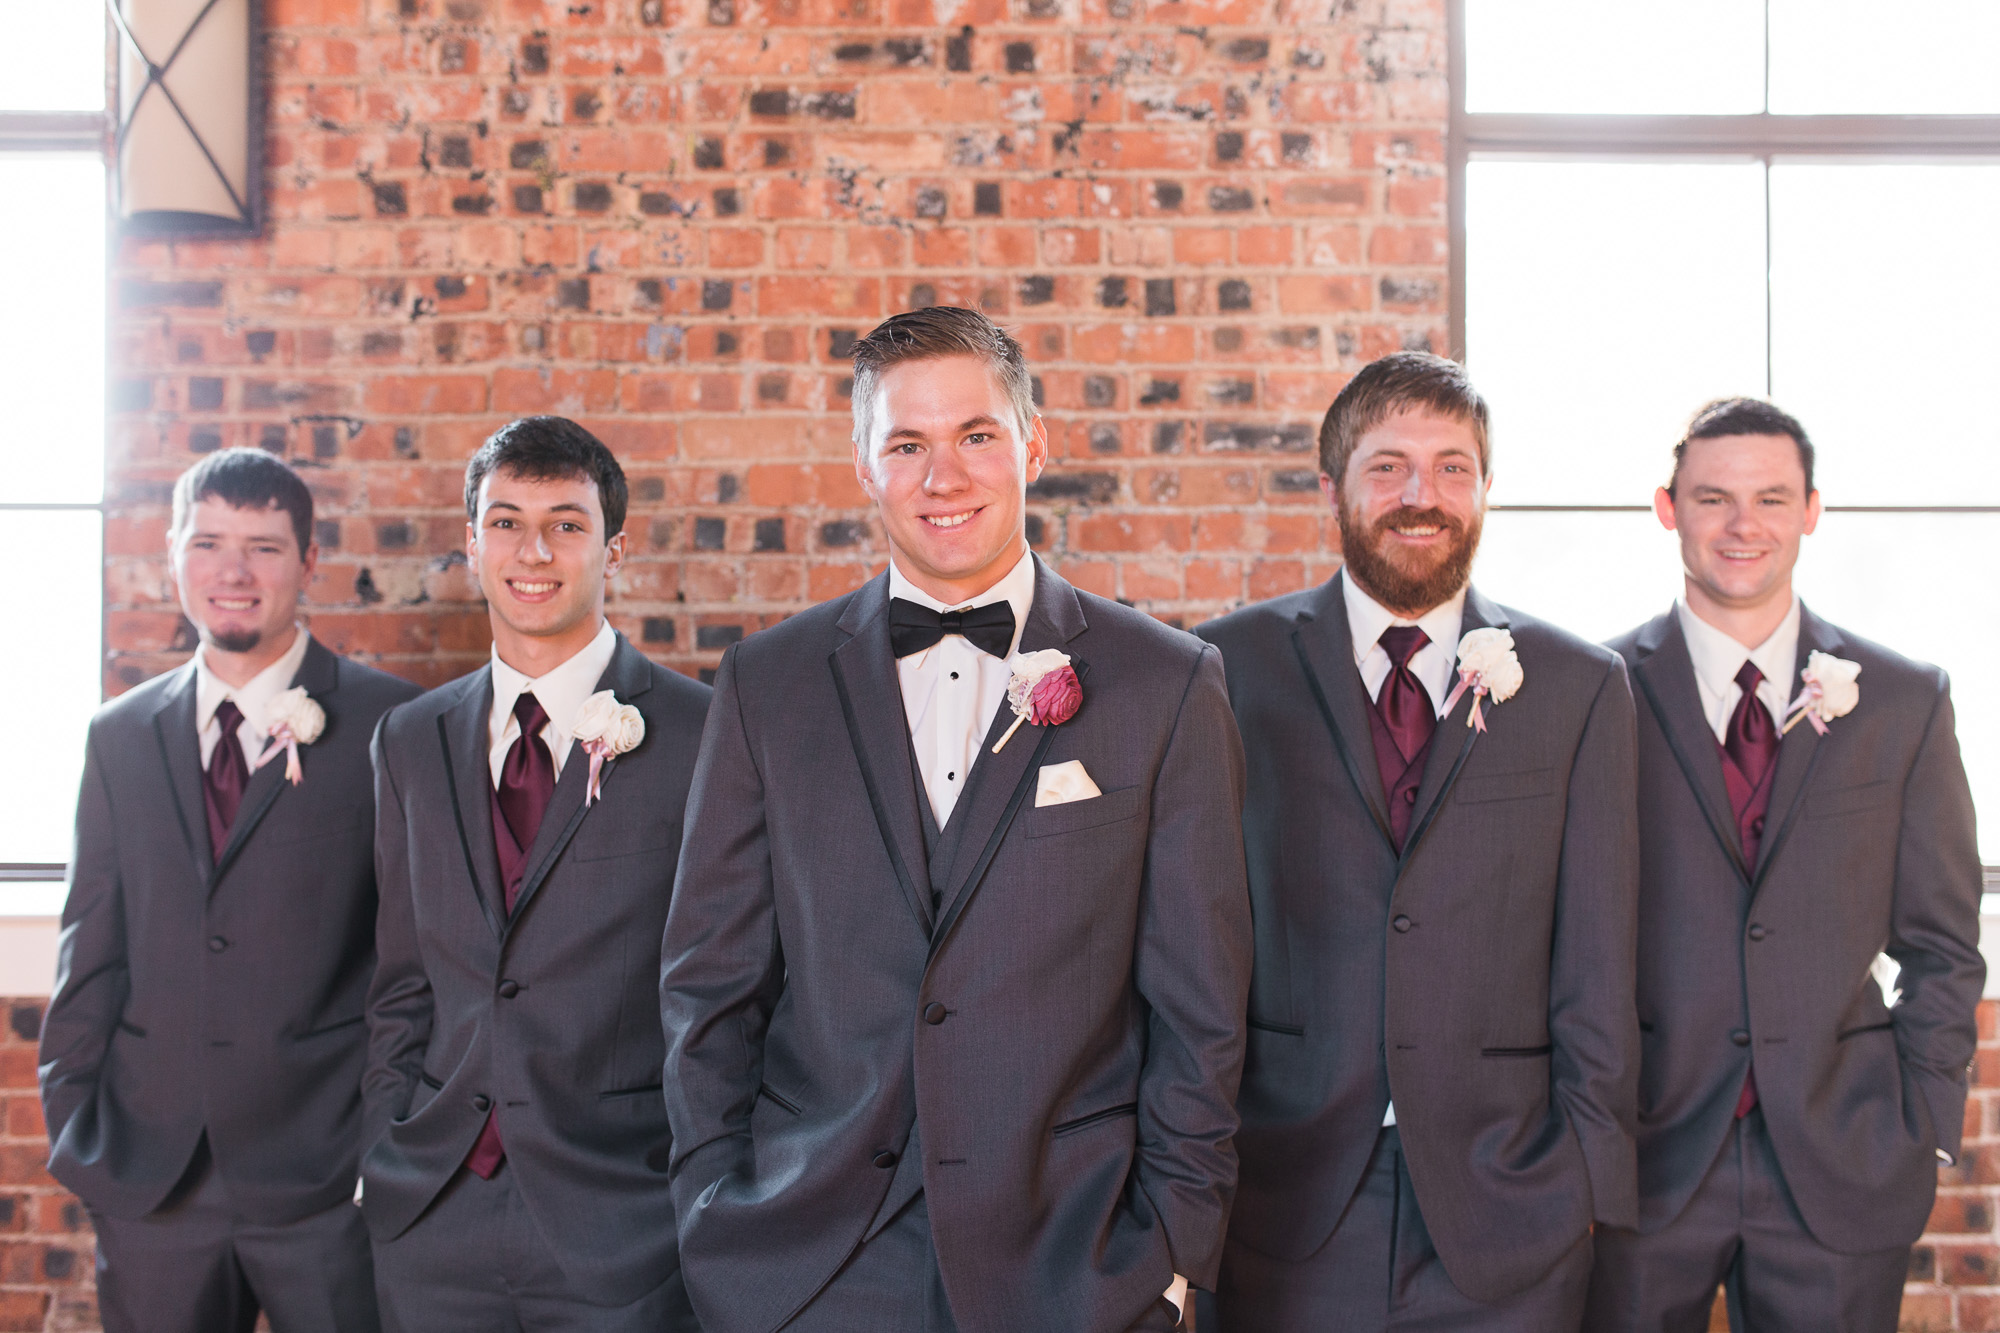 707cb-downtown-bryan-weddingdowntown-bryan-wedding.jpg